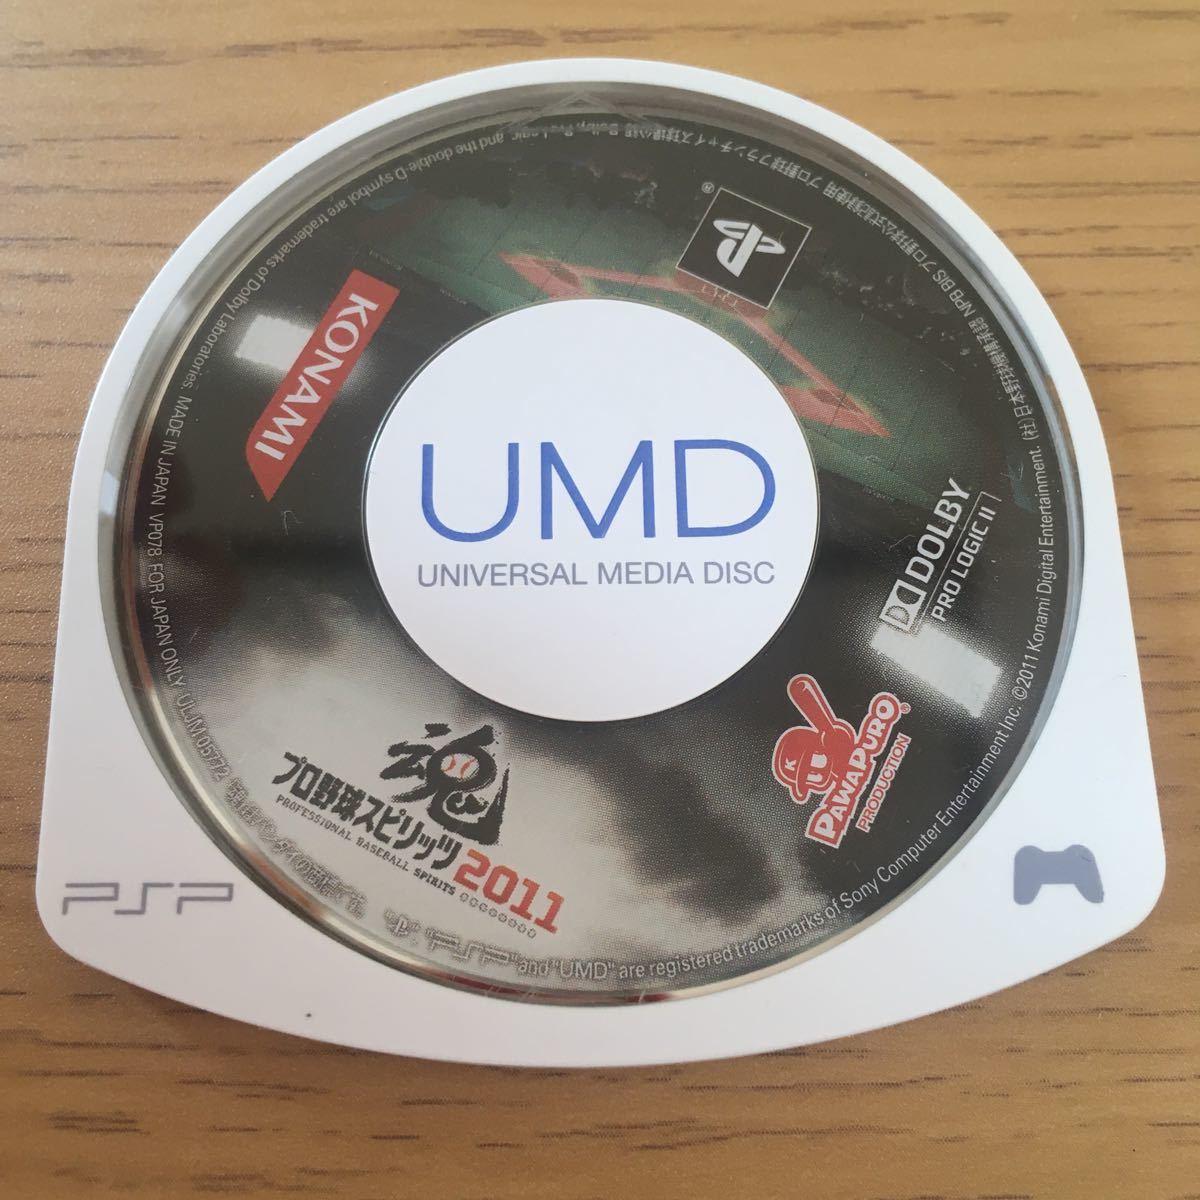 PSPソフト プロ野球スピリッツ 野球ソフト  ソフト ゲームソフト カセット